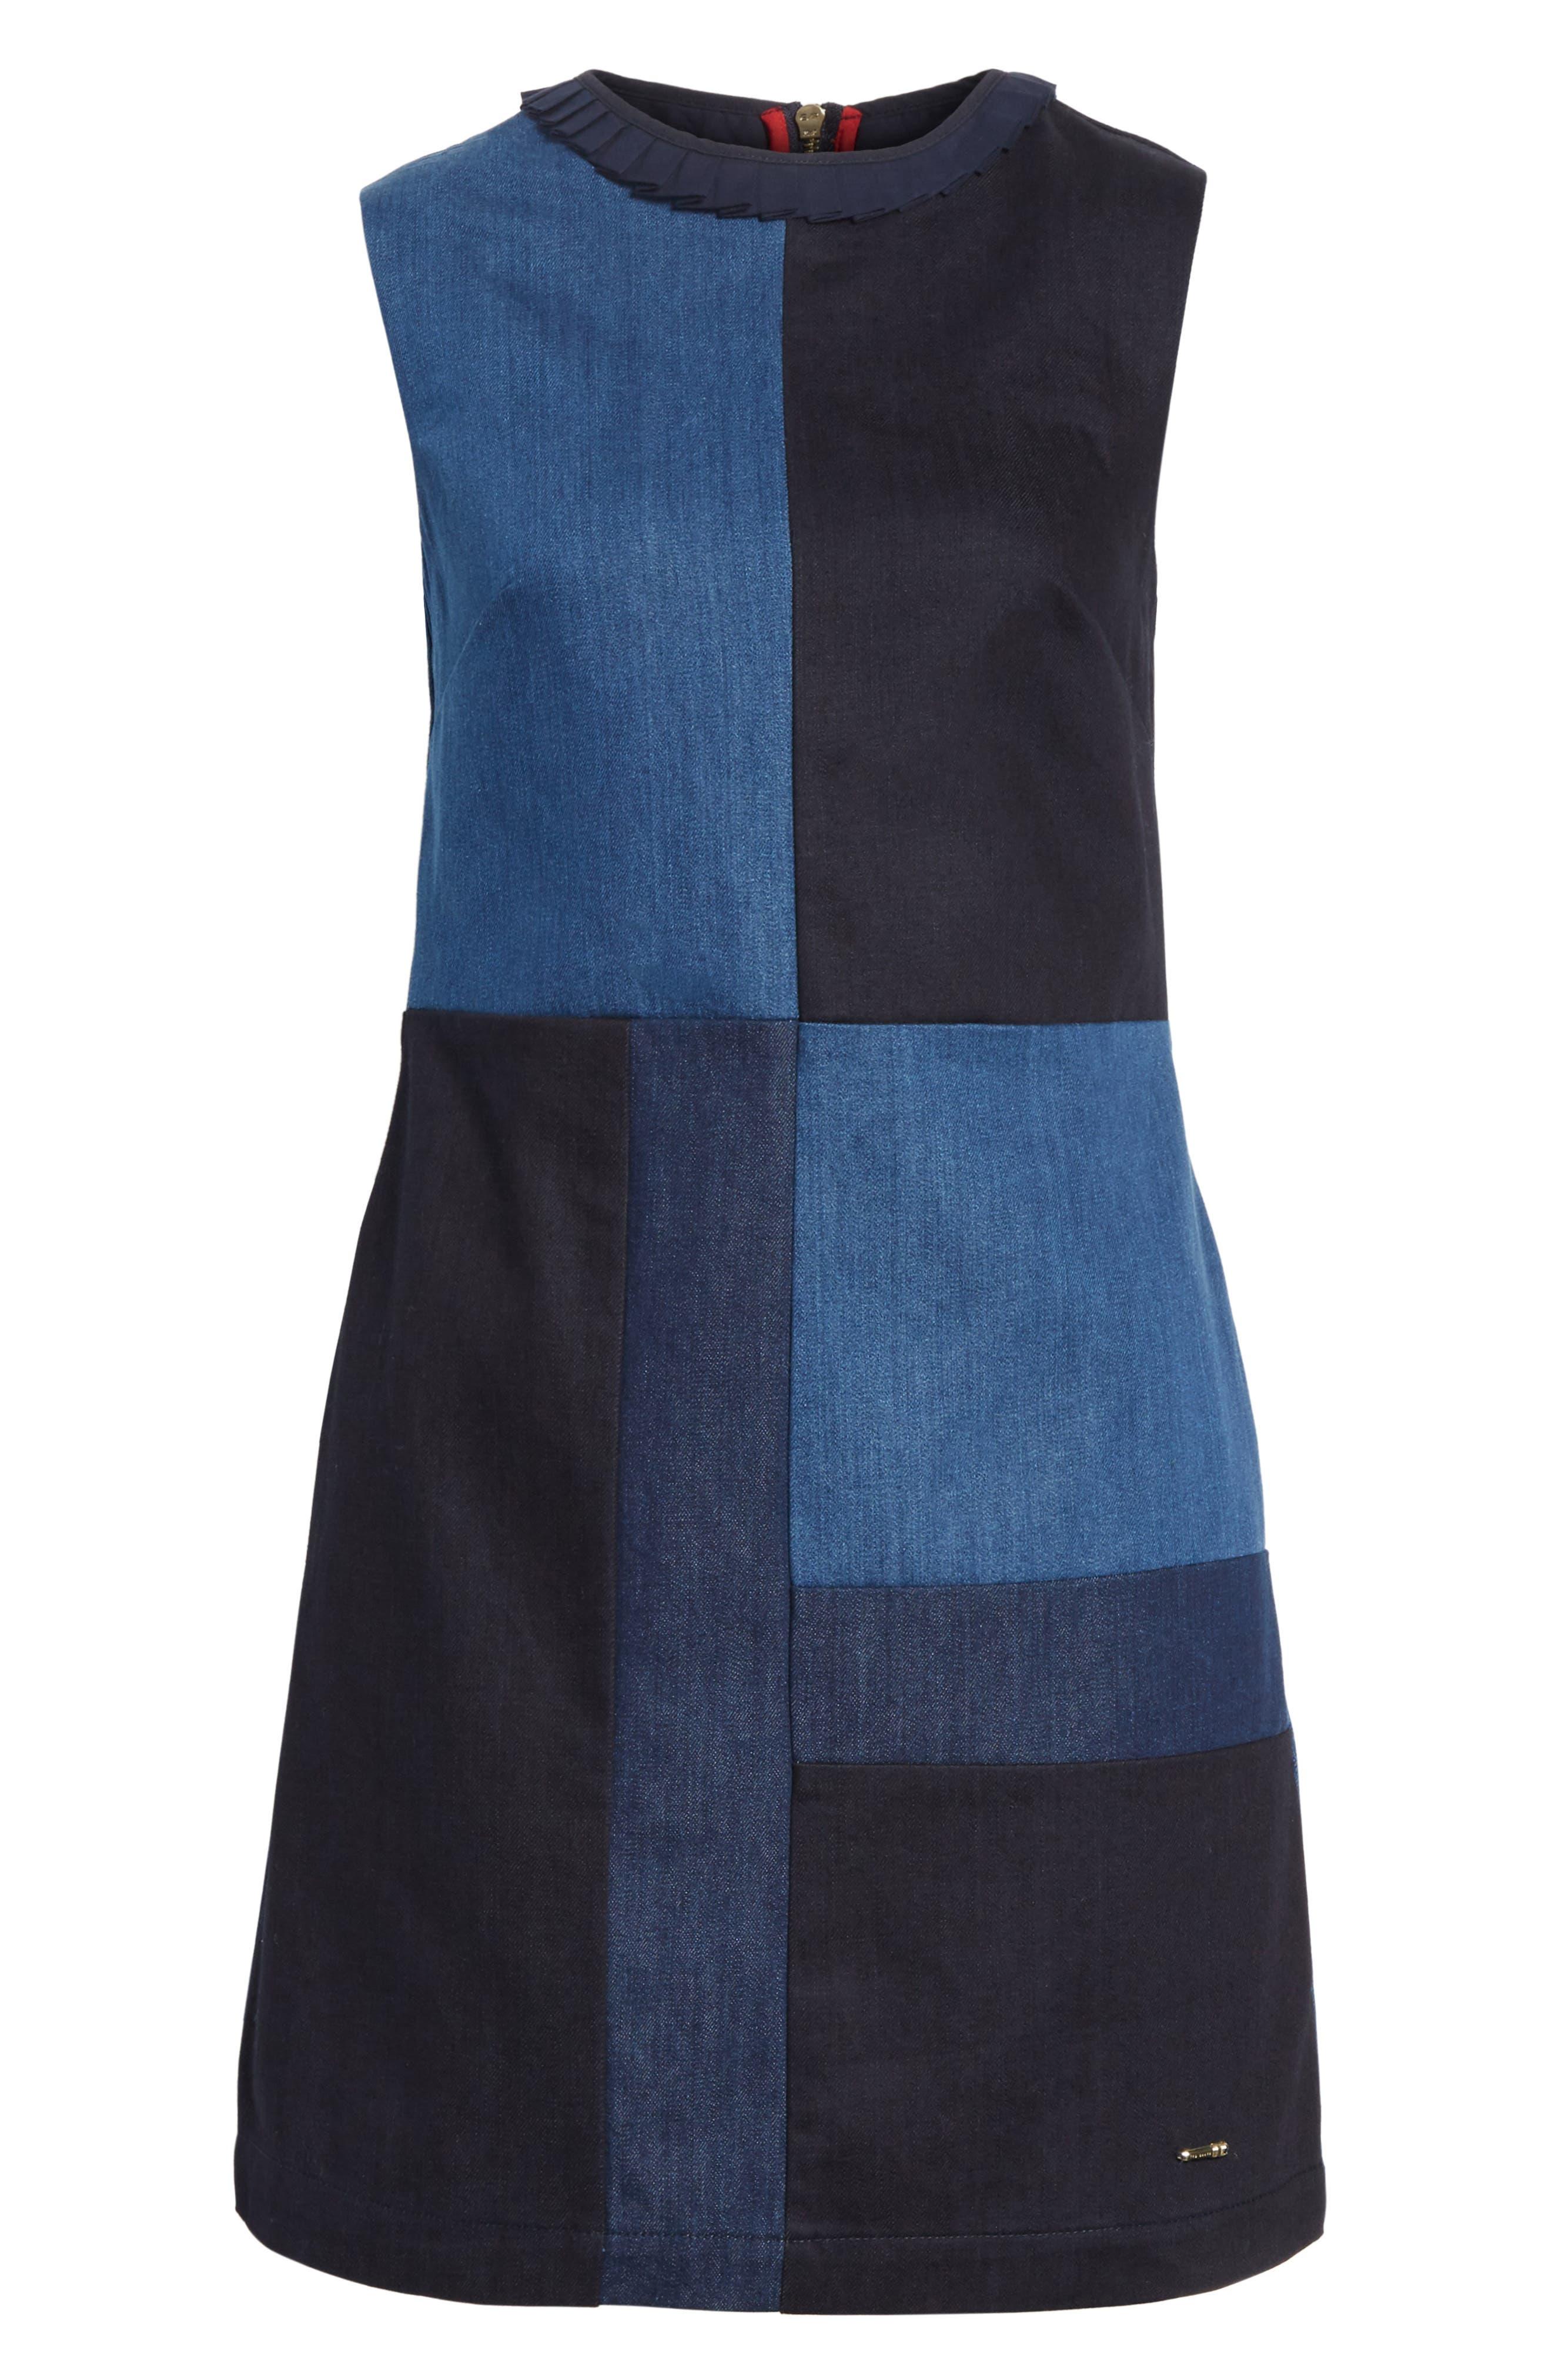 Ted Baker Morfee London Colorblock Denim A-Line Dress,                             Alternate thumbnail 6, color,                             431